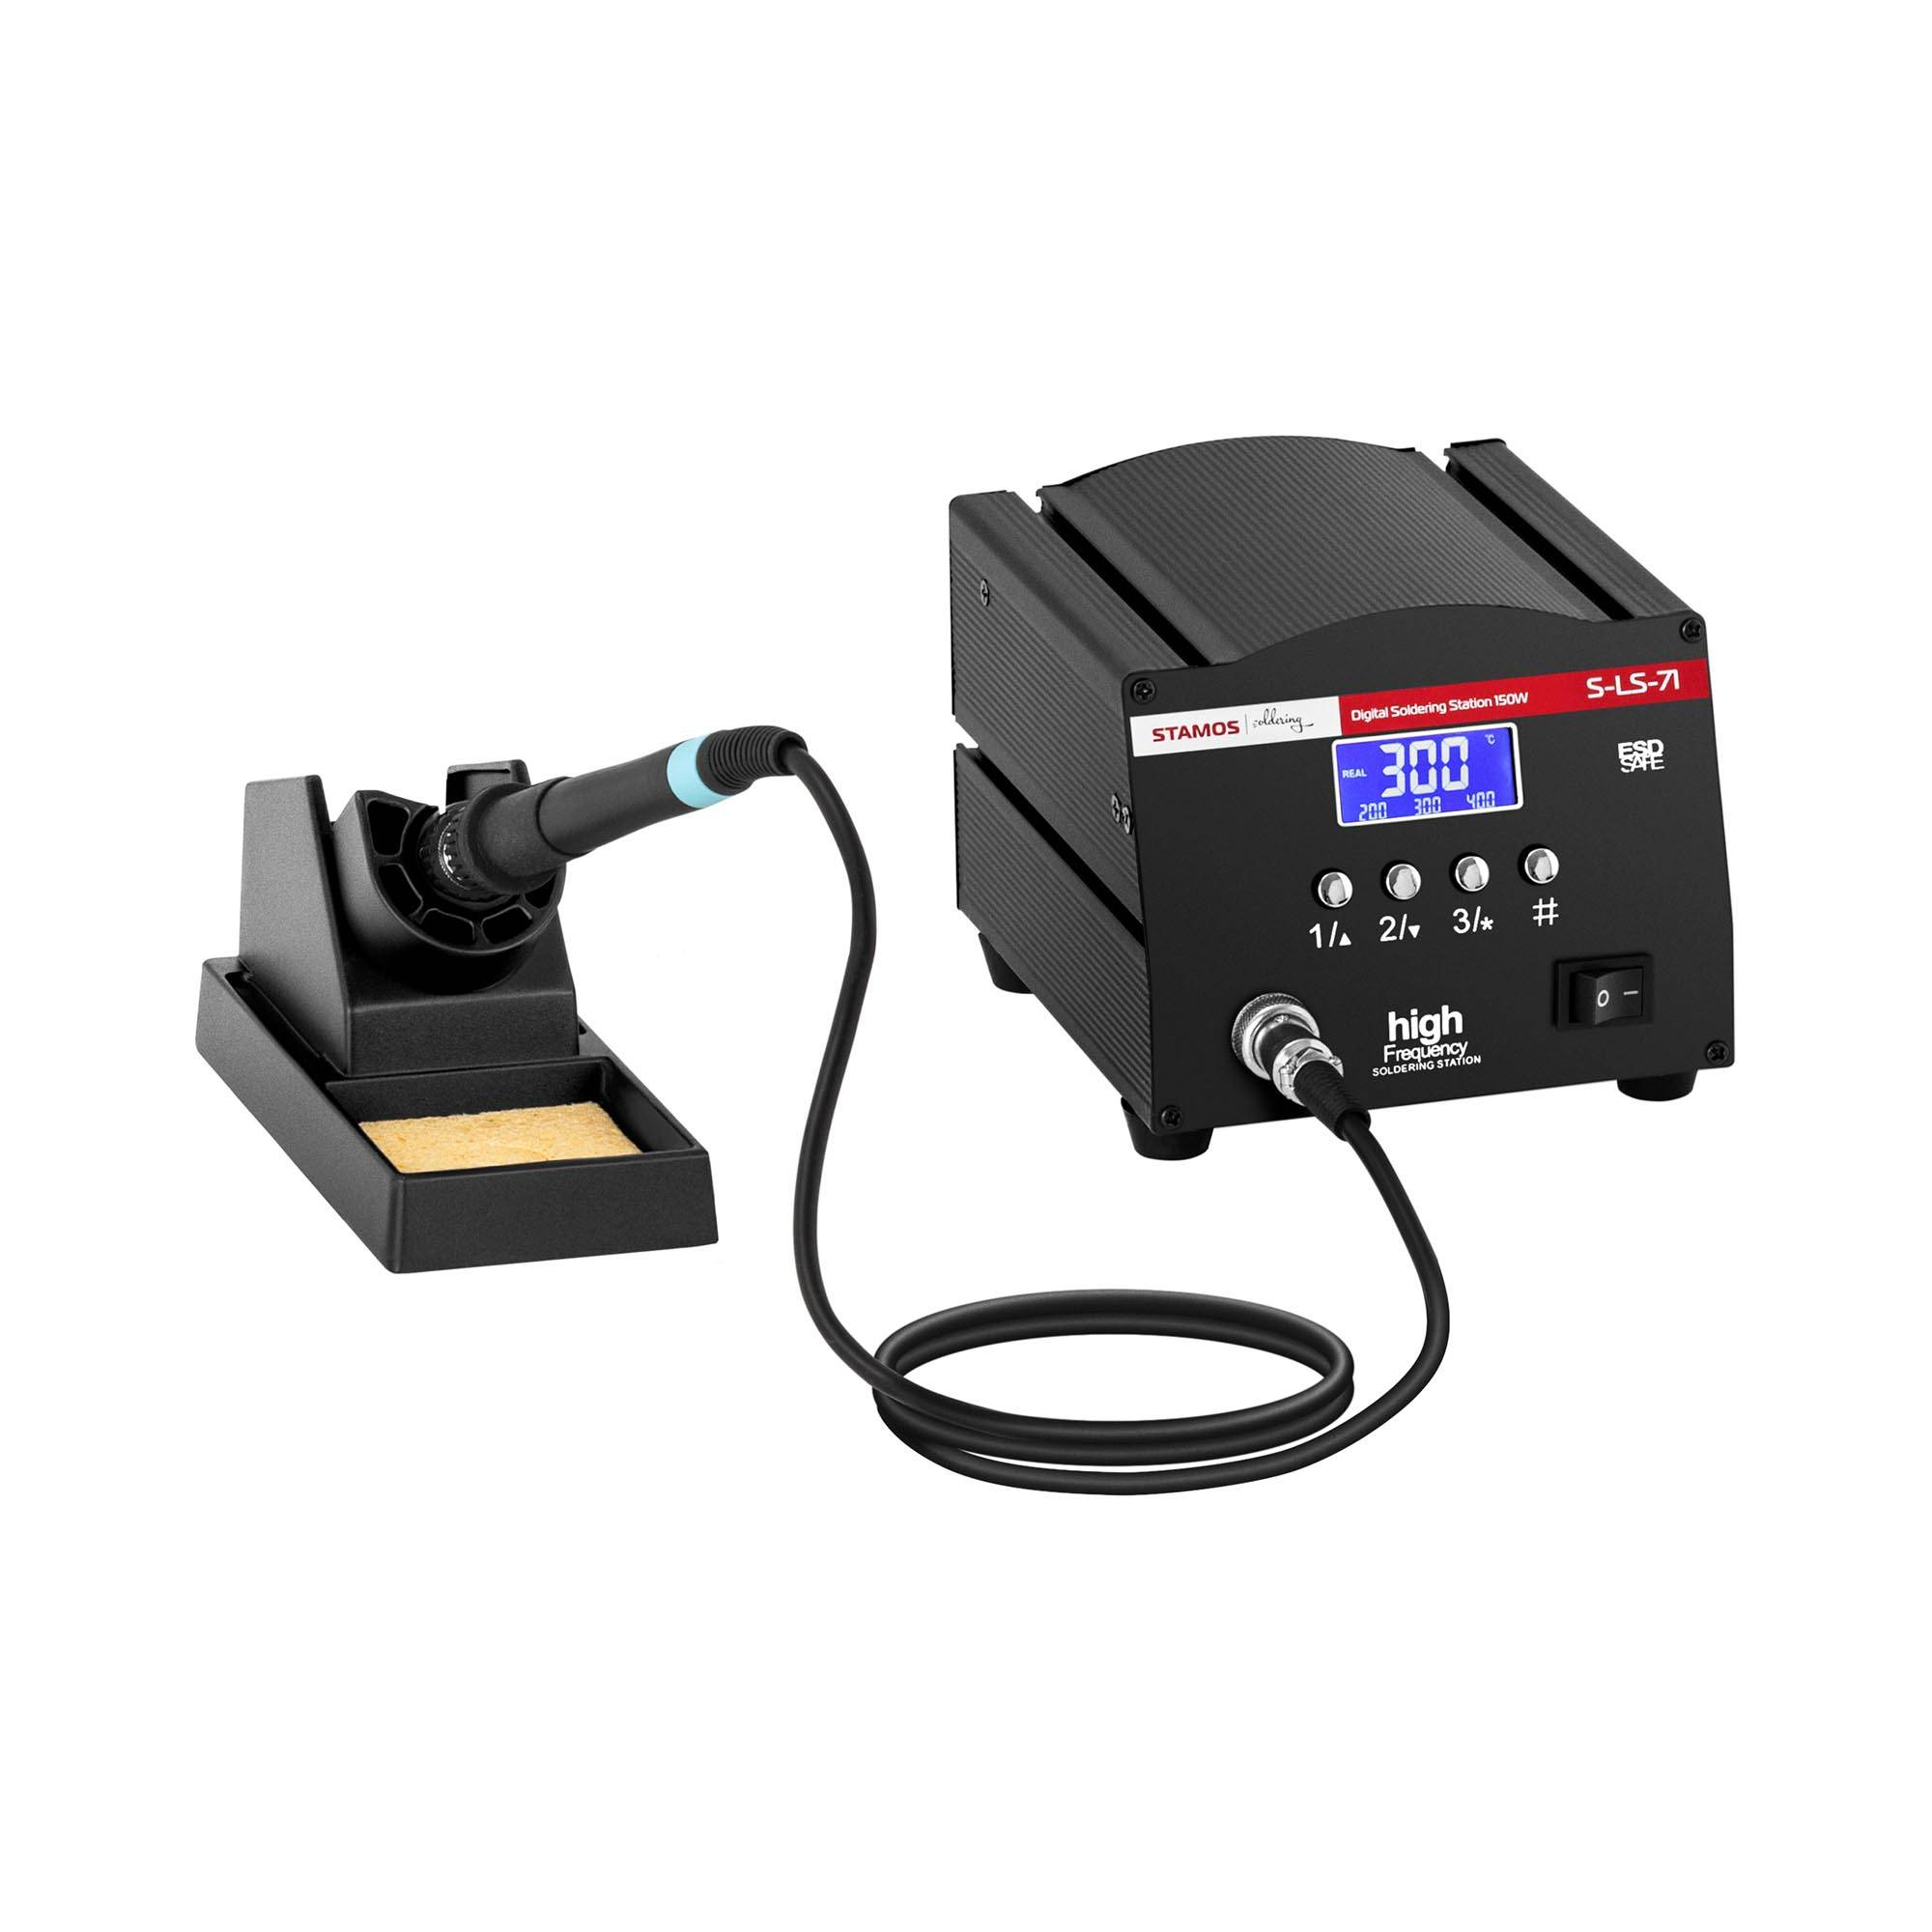 Stamos Soldering Loddestation - digital - med loddekolbe og loddekolbeholder - 150 W - LCD S-LS-71